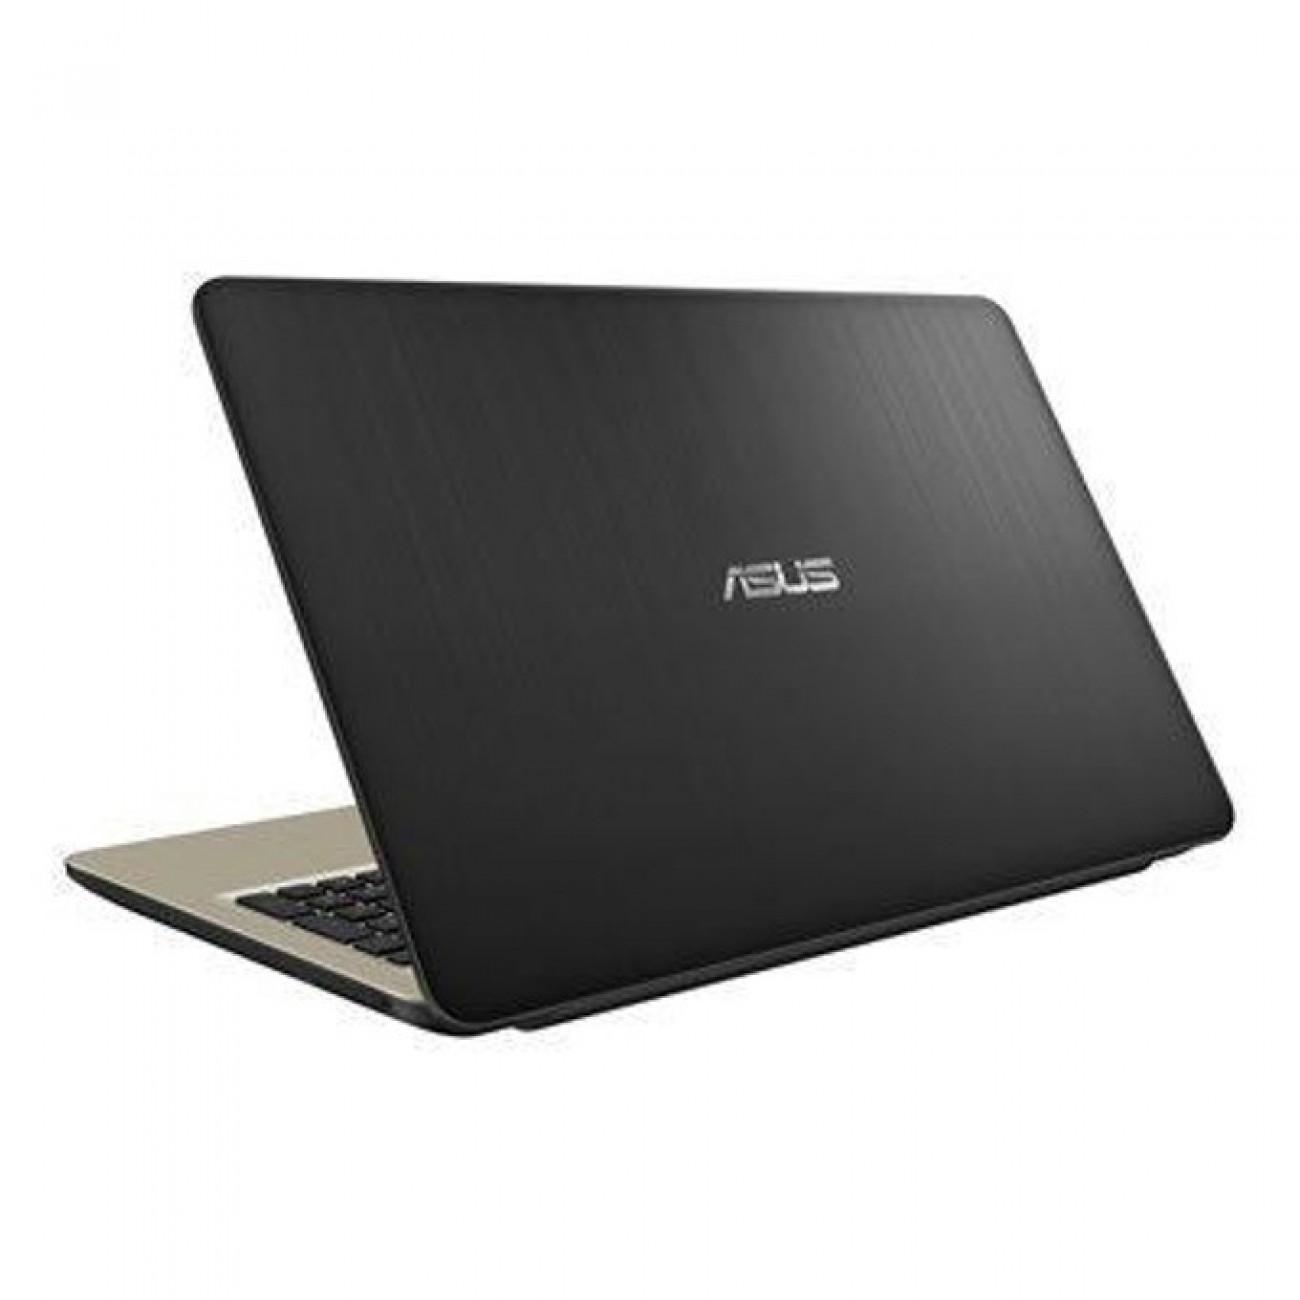 Лаптоп Asus X540MA-DM196 (X540MA-DM196), двуядрен Gemini Lake Intel Celeron N4000 1.10/2.6 GHz, 15.6 (39.62 cm) Full HD Anti-Glare Display, (HDMI), 4GB LPDDR4, 1TB HDD, 1x USB 3.0, Endless OS, 2.00 kg в Лаптопи - Asus | Alleop